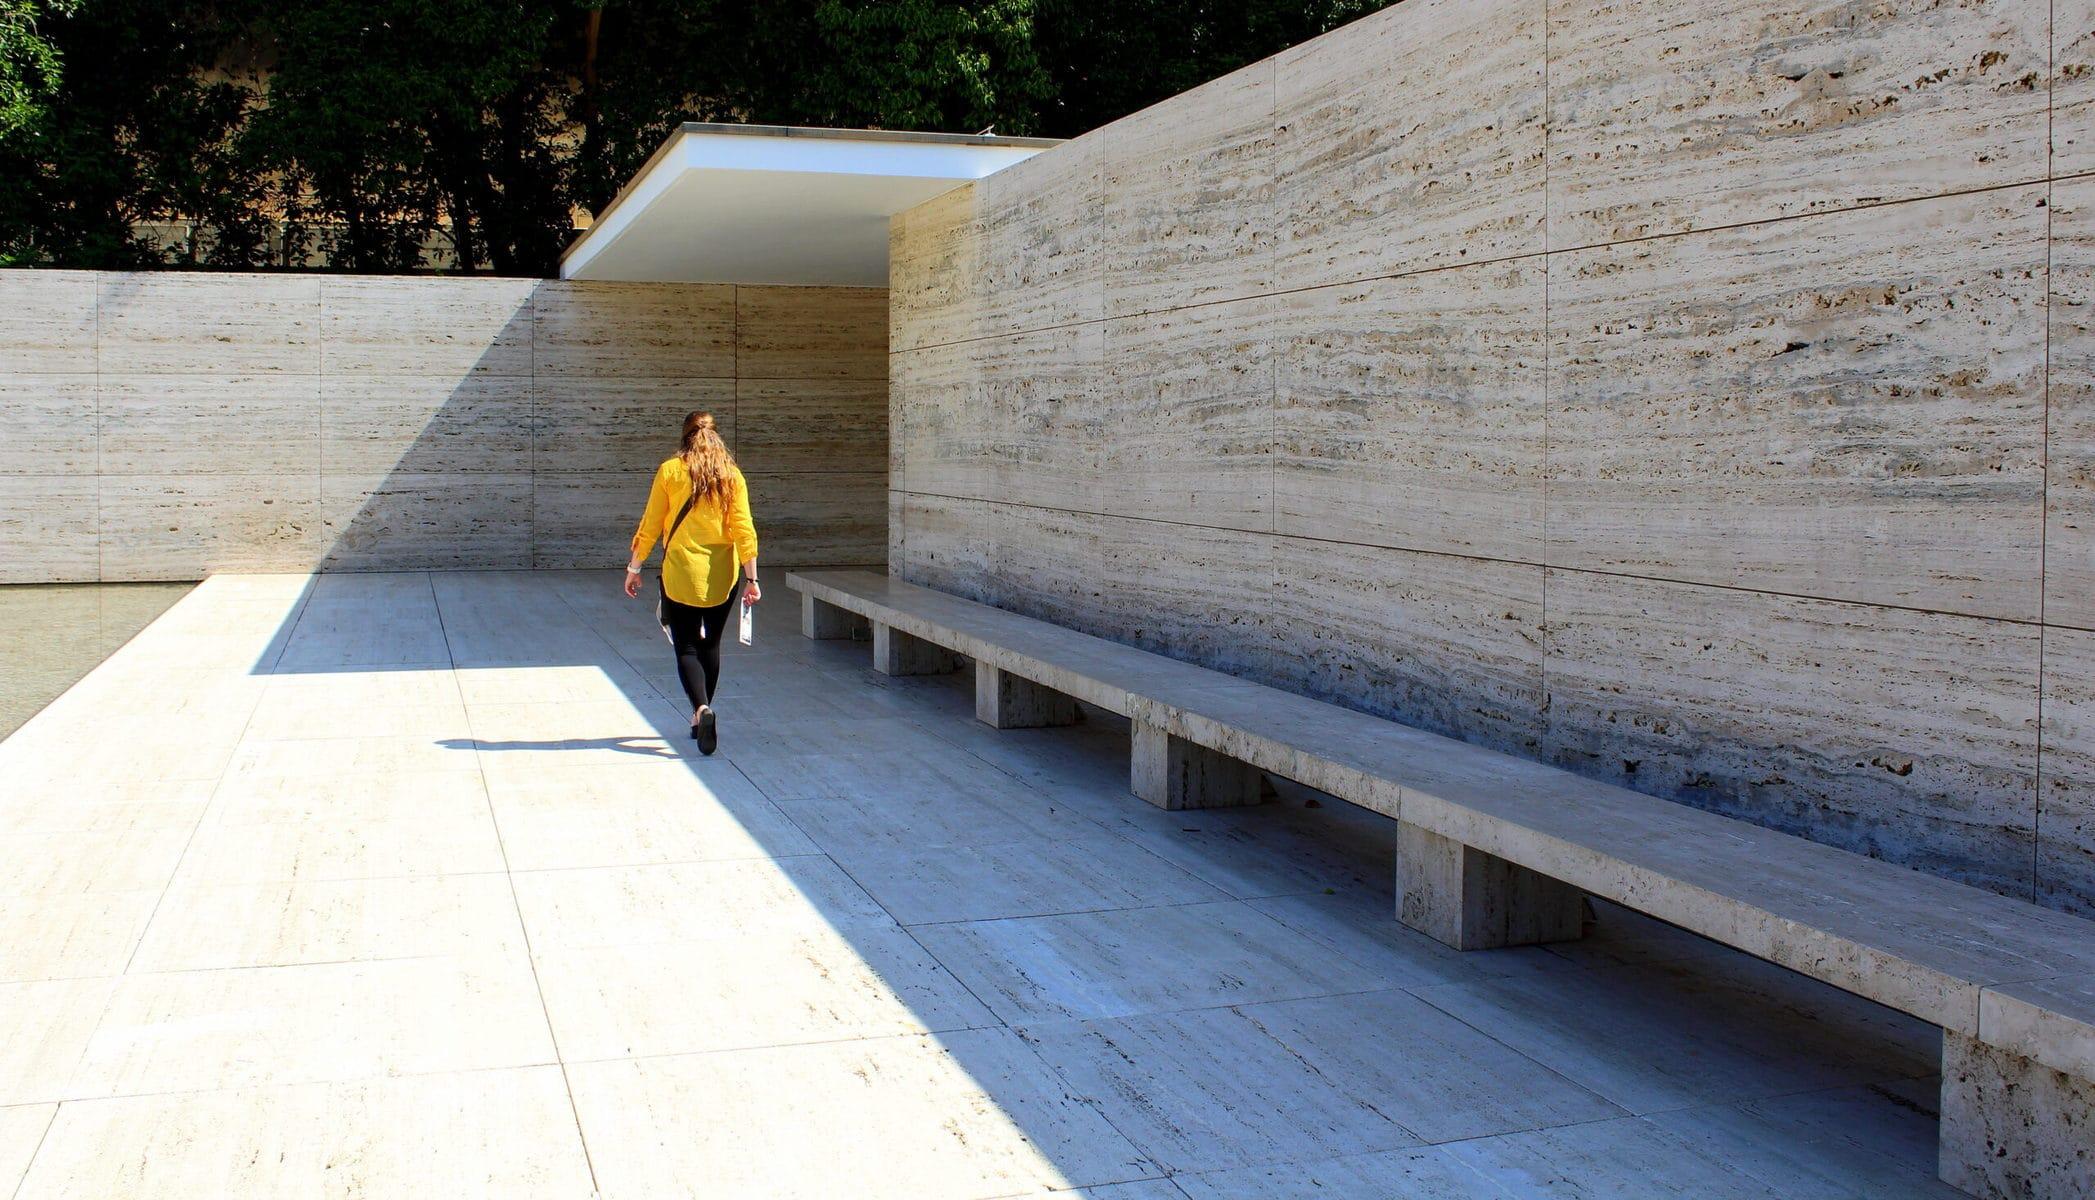 Pavillon Mies van der Rohes in Barcelona